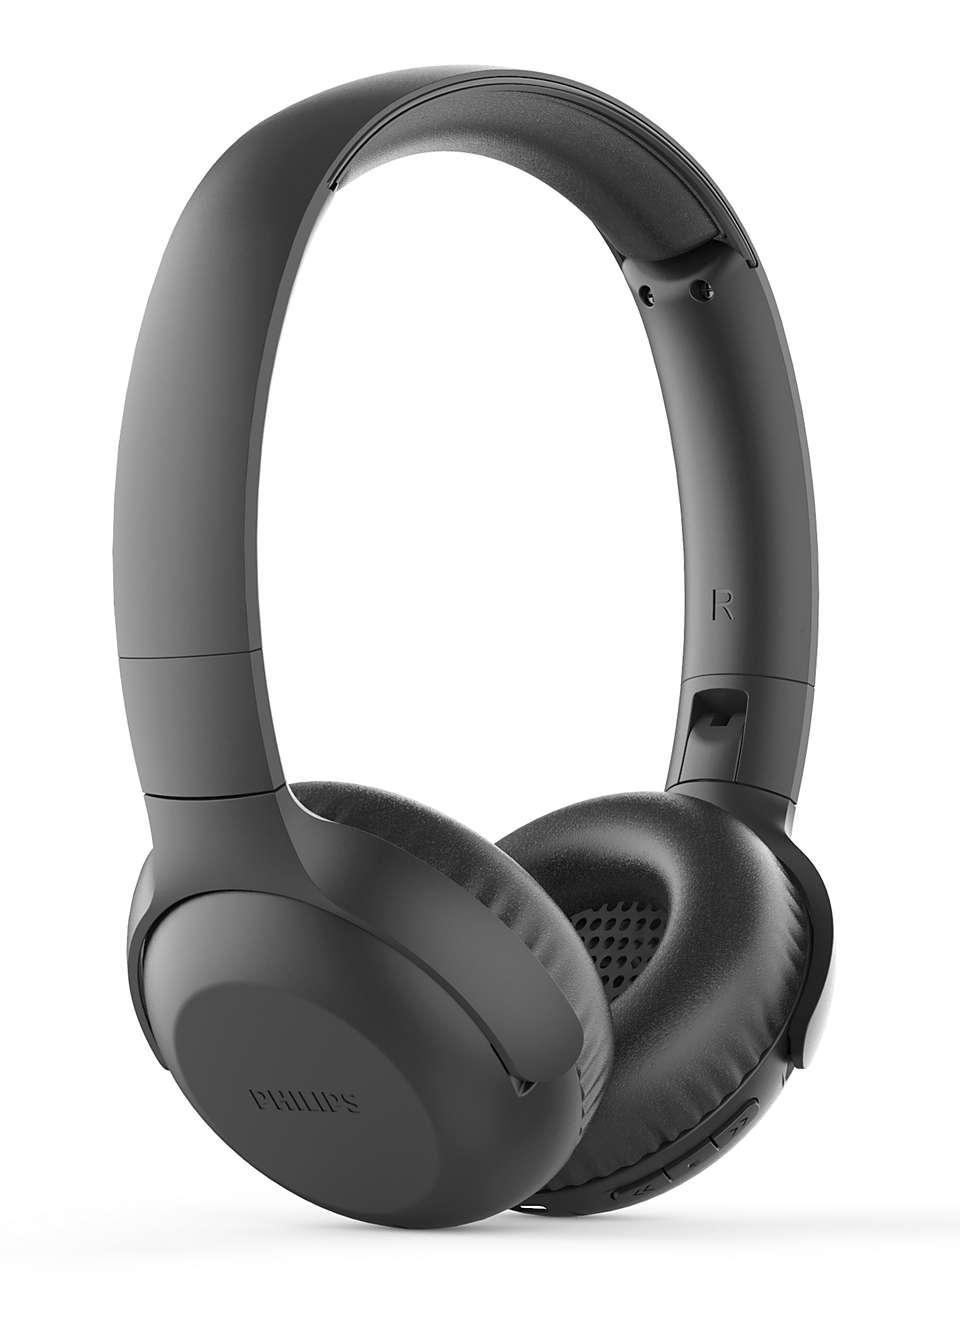 Fone De Ouvido Headphone Philips Wireless Sem Fio Preto - Tauh202bk/00